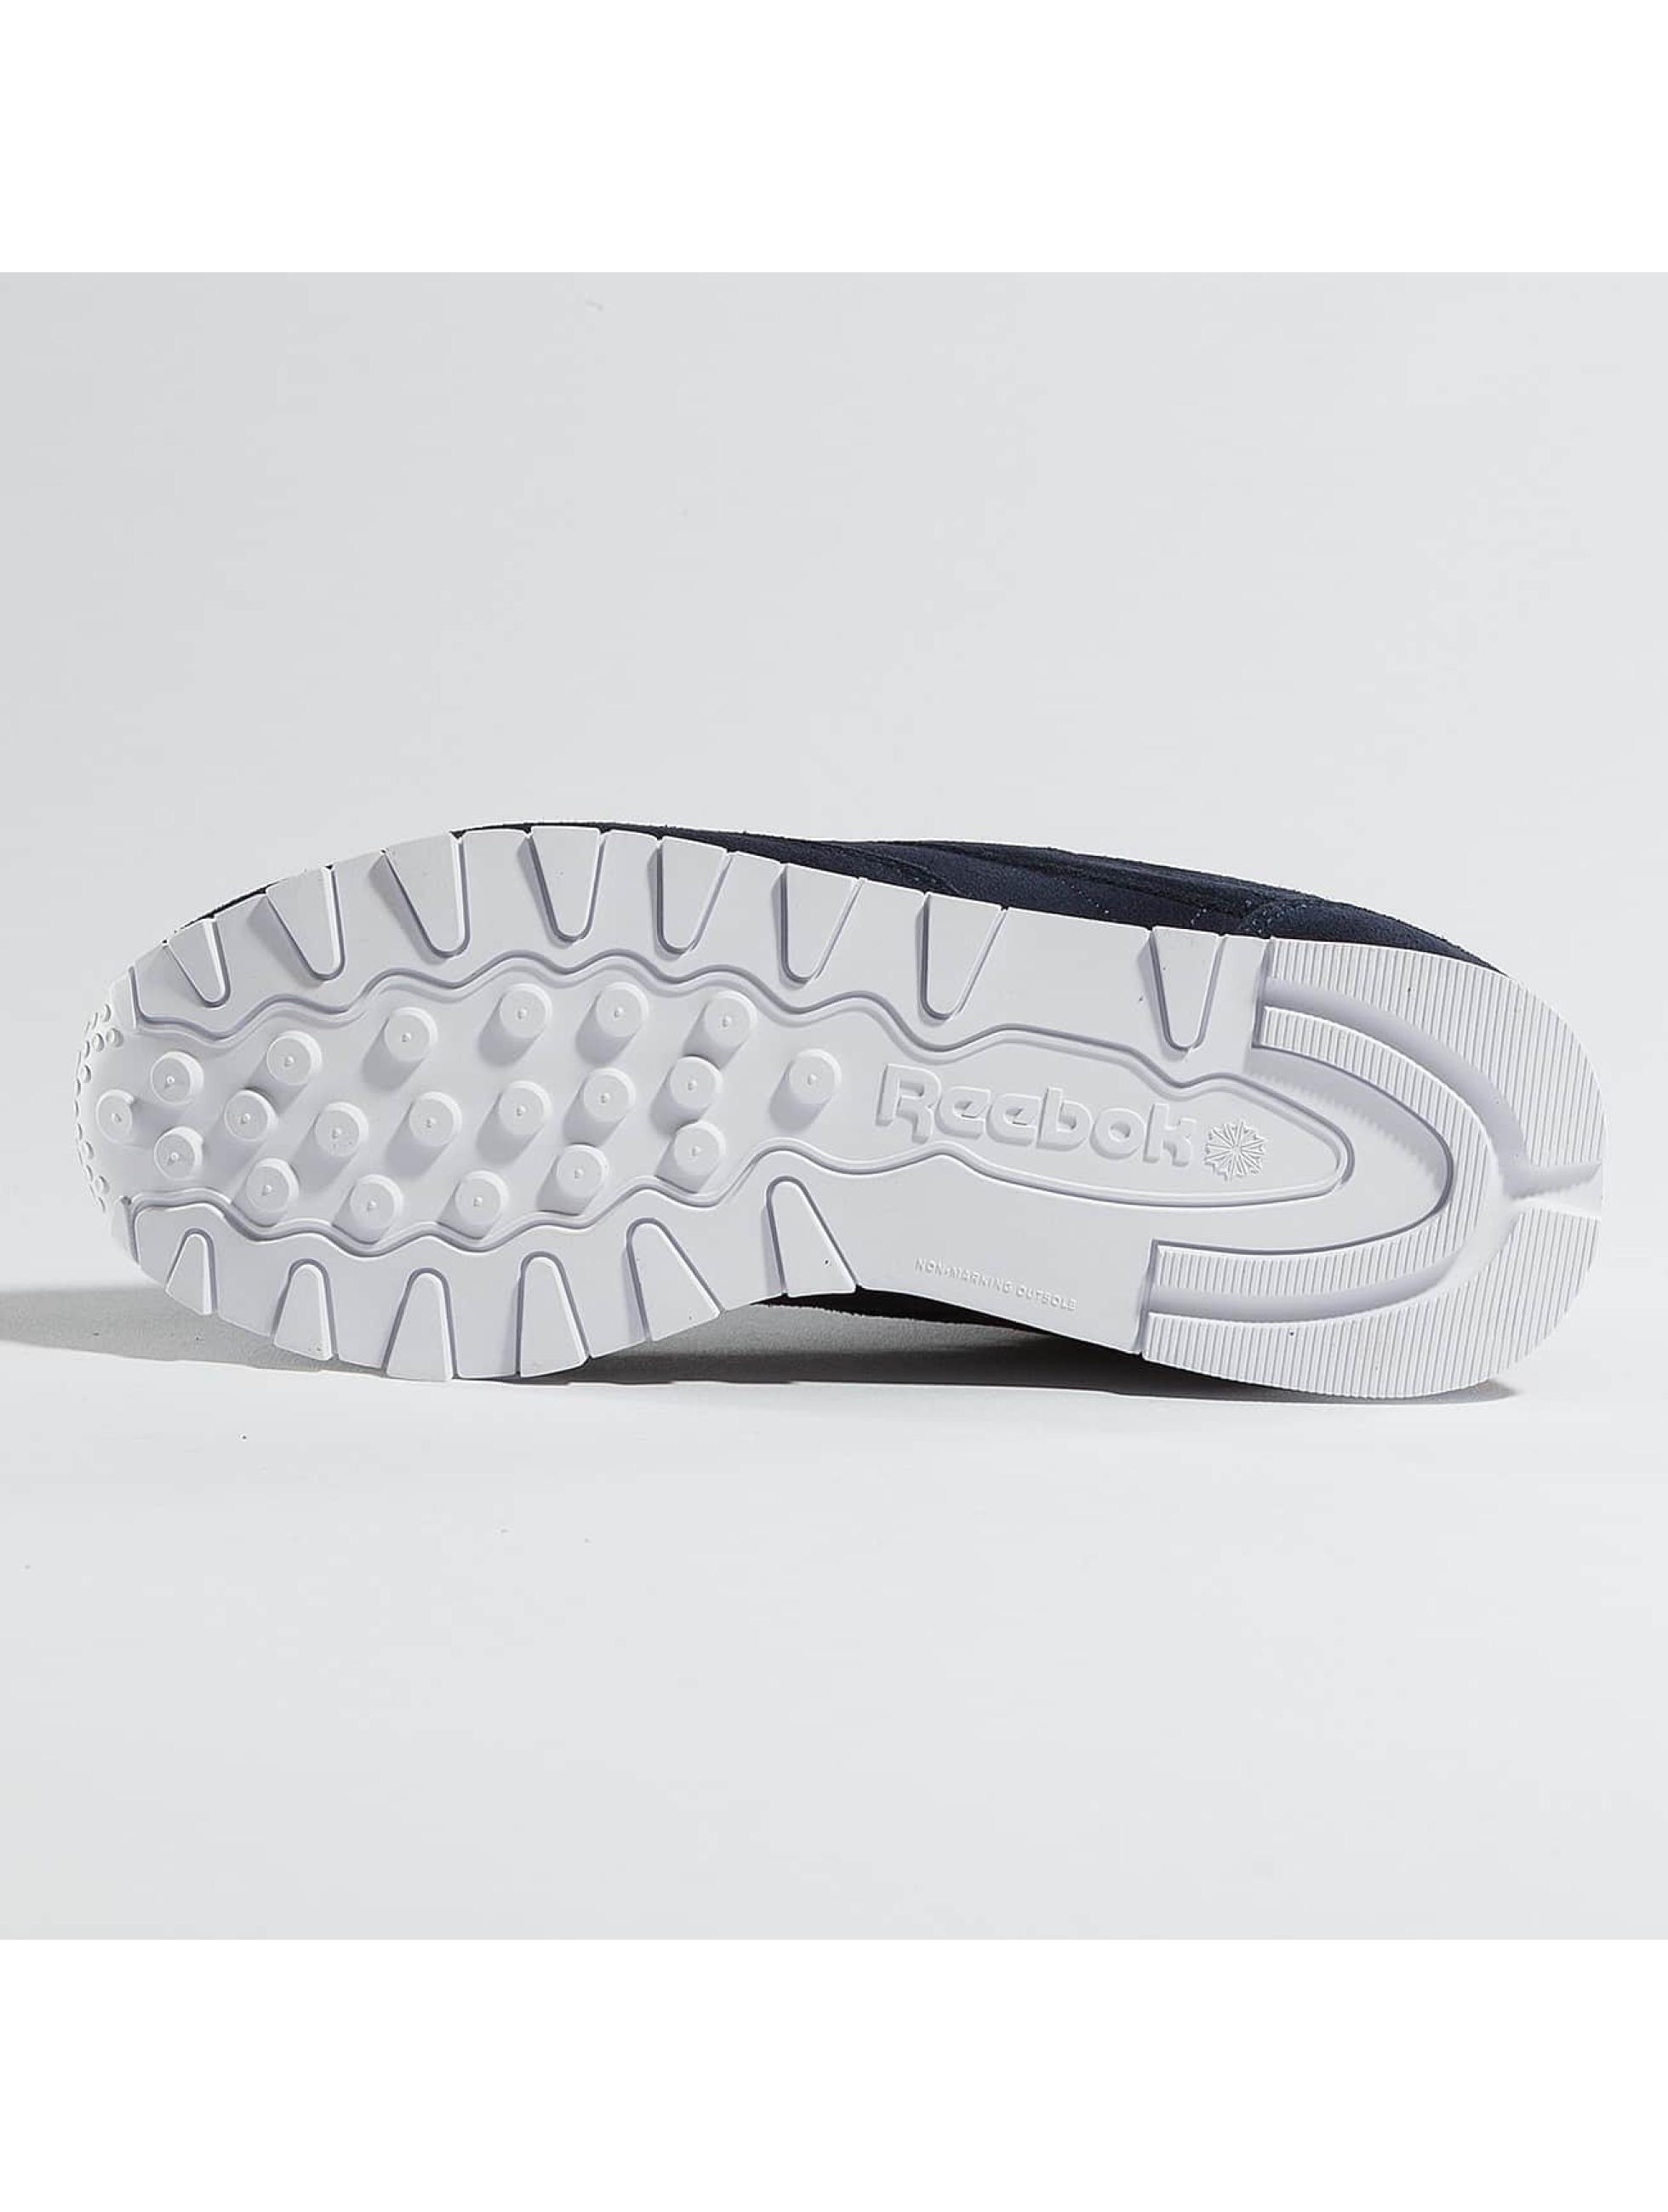 Reebok Zapatillas de deporte Classic Leather MH índigo